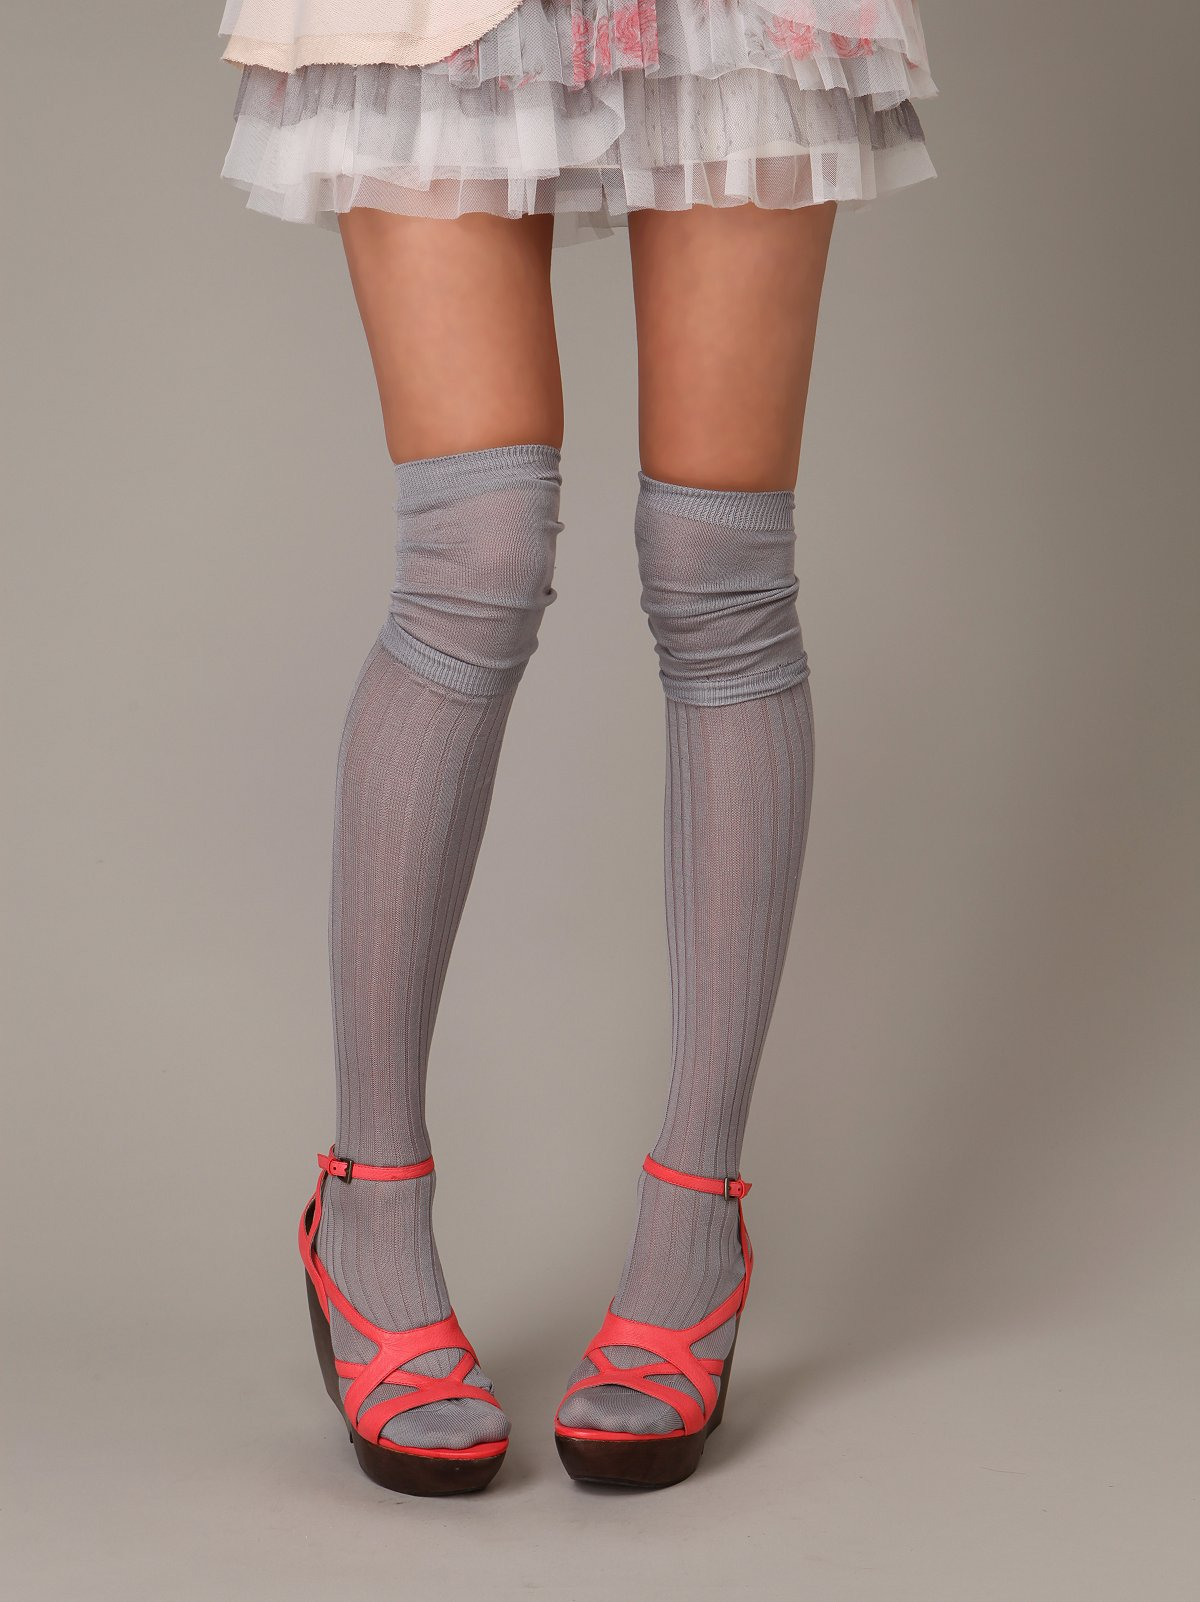 Leona Layered Tall Sock